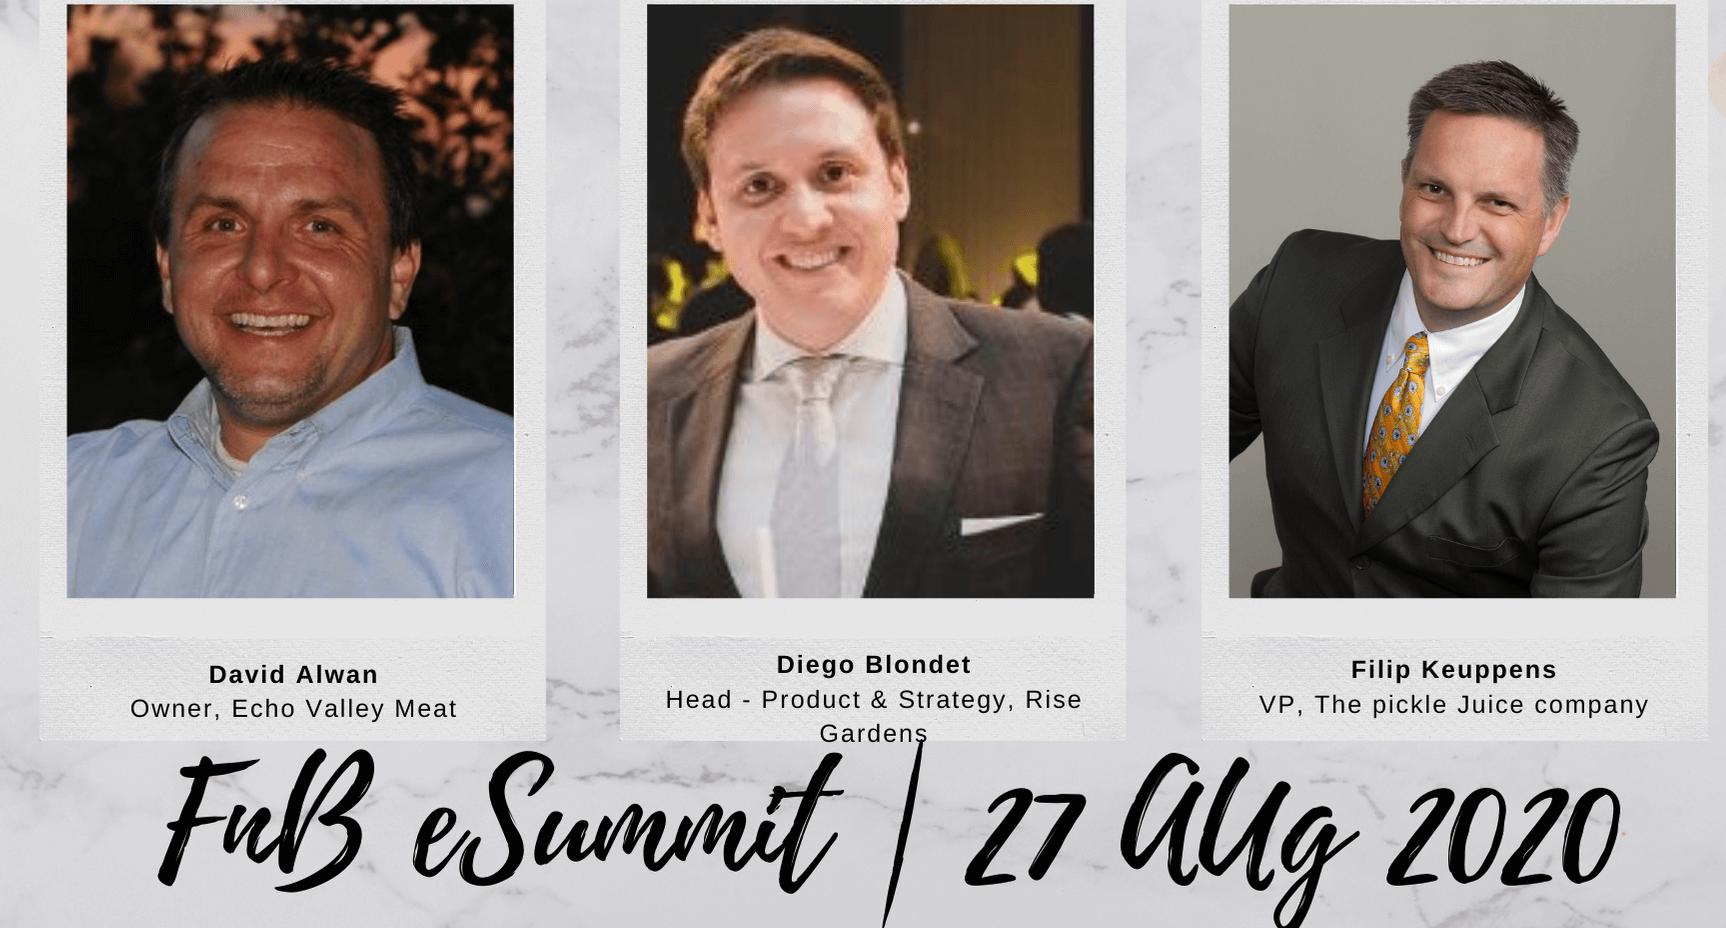 Day 4 – Session 1: F&B e-Summit 2020 (Aug 27th, 2020)